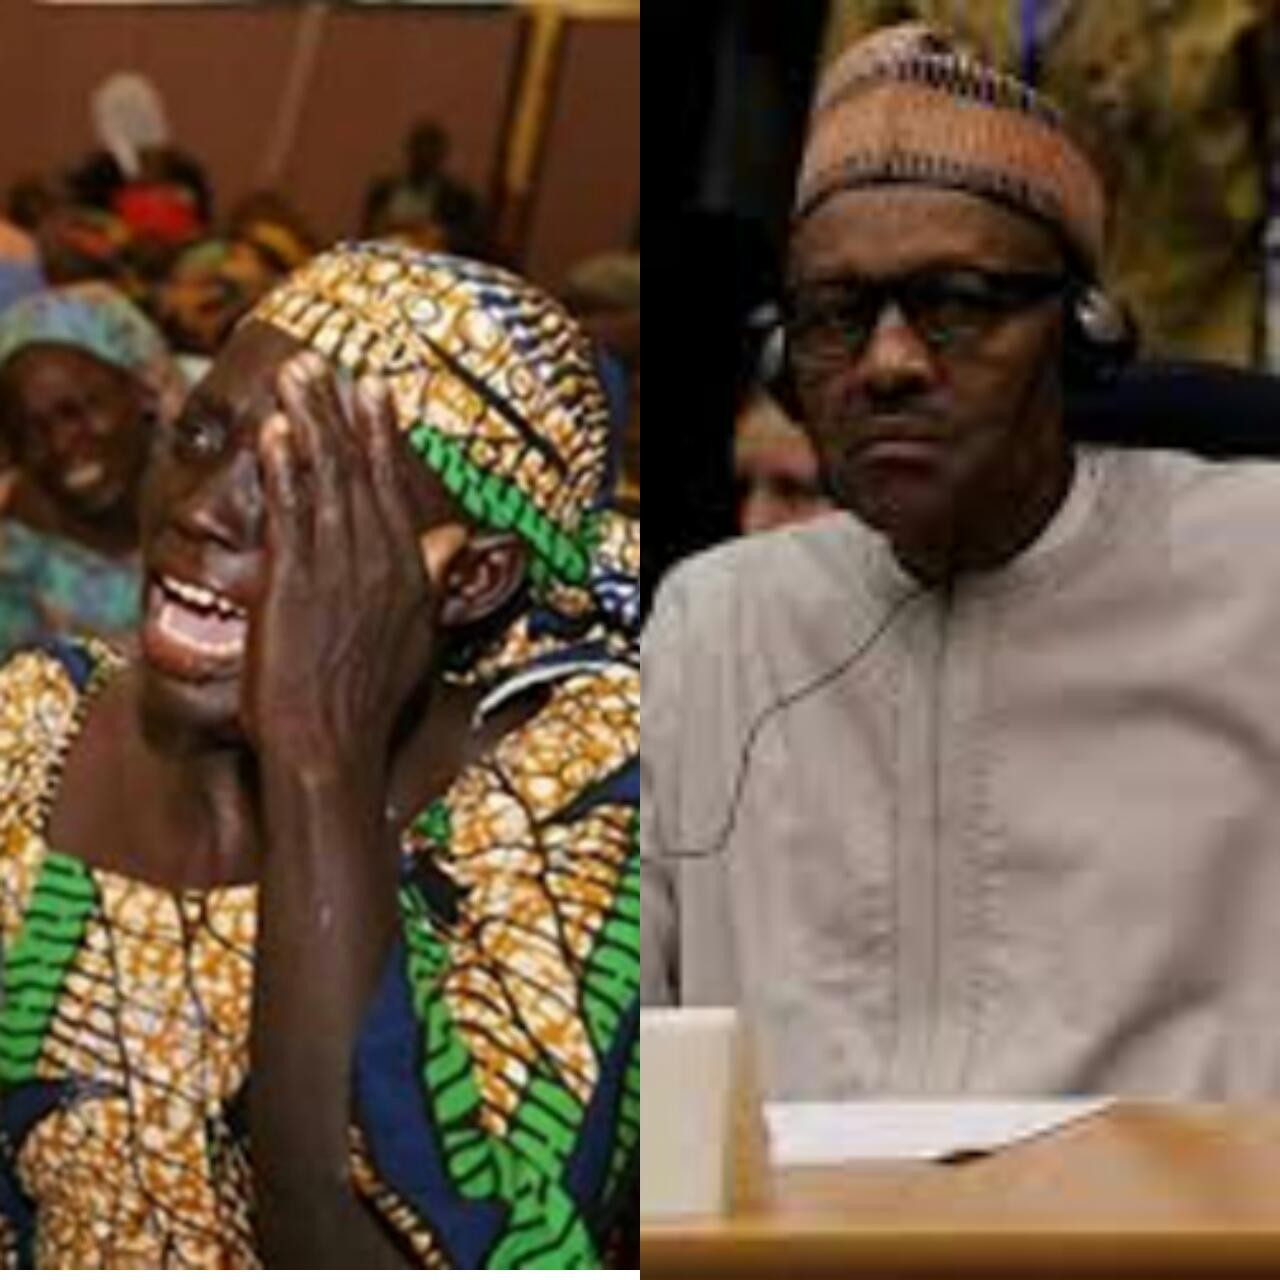 LATEST BREAKING NEWS: Nigeria's President Muhammadu Buhari